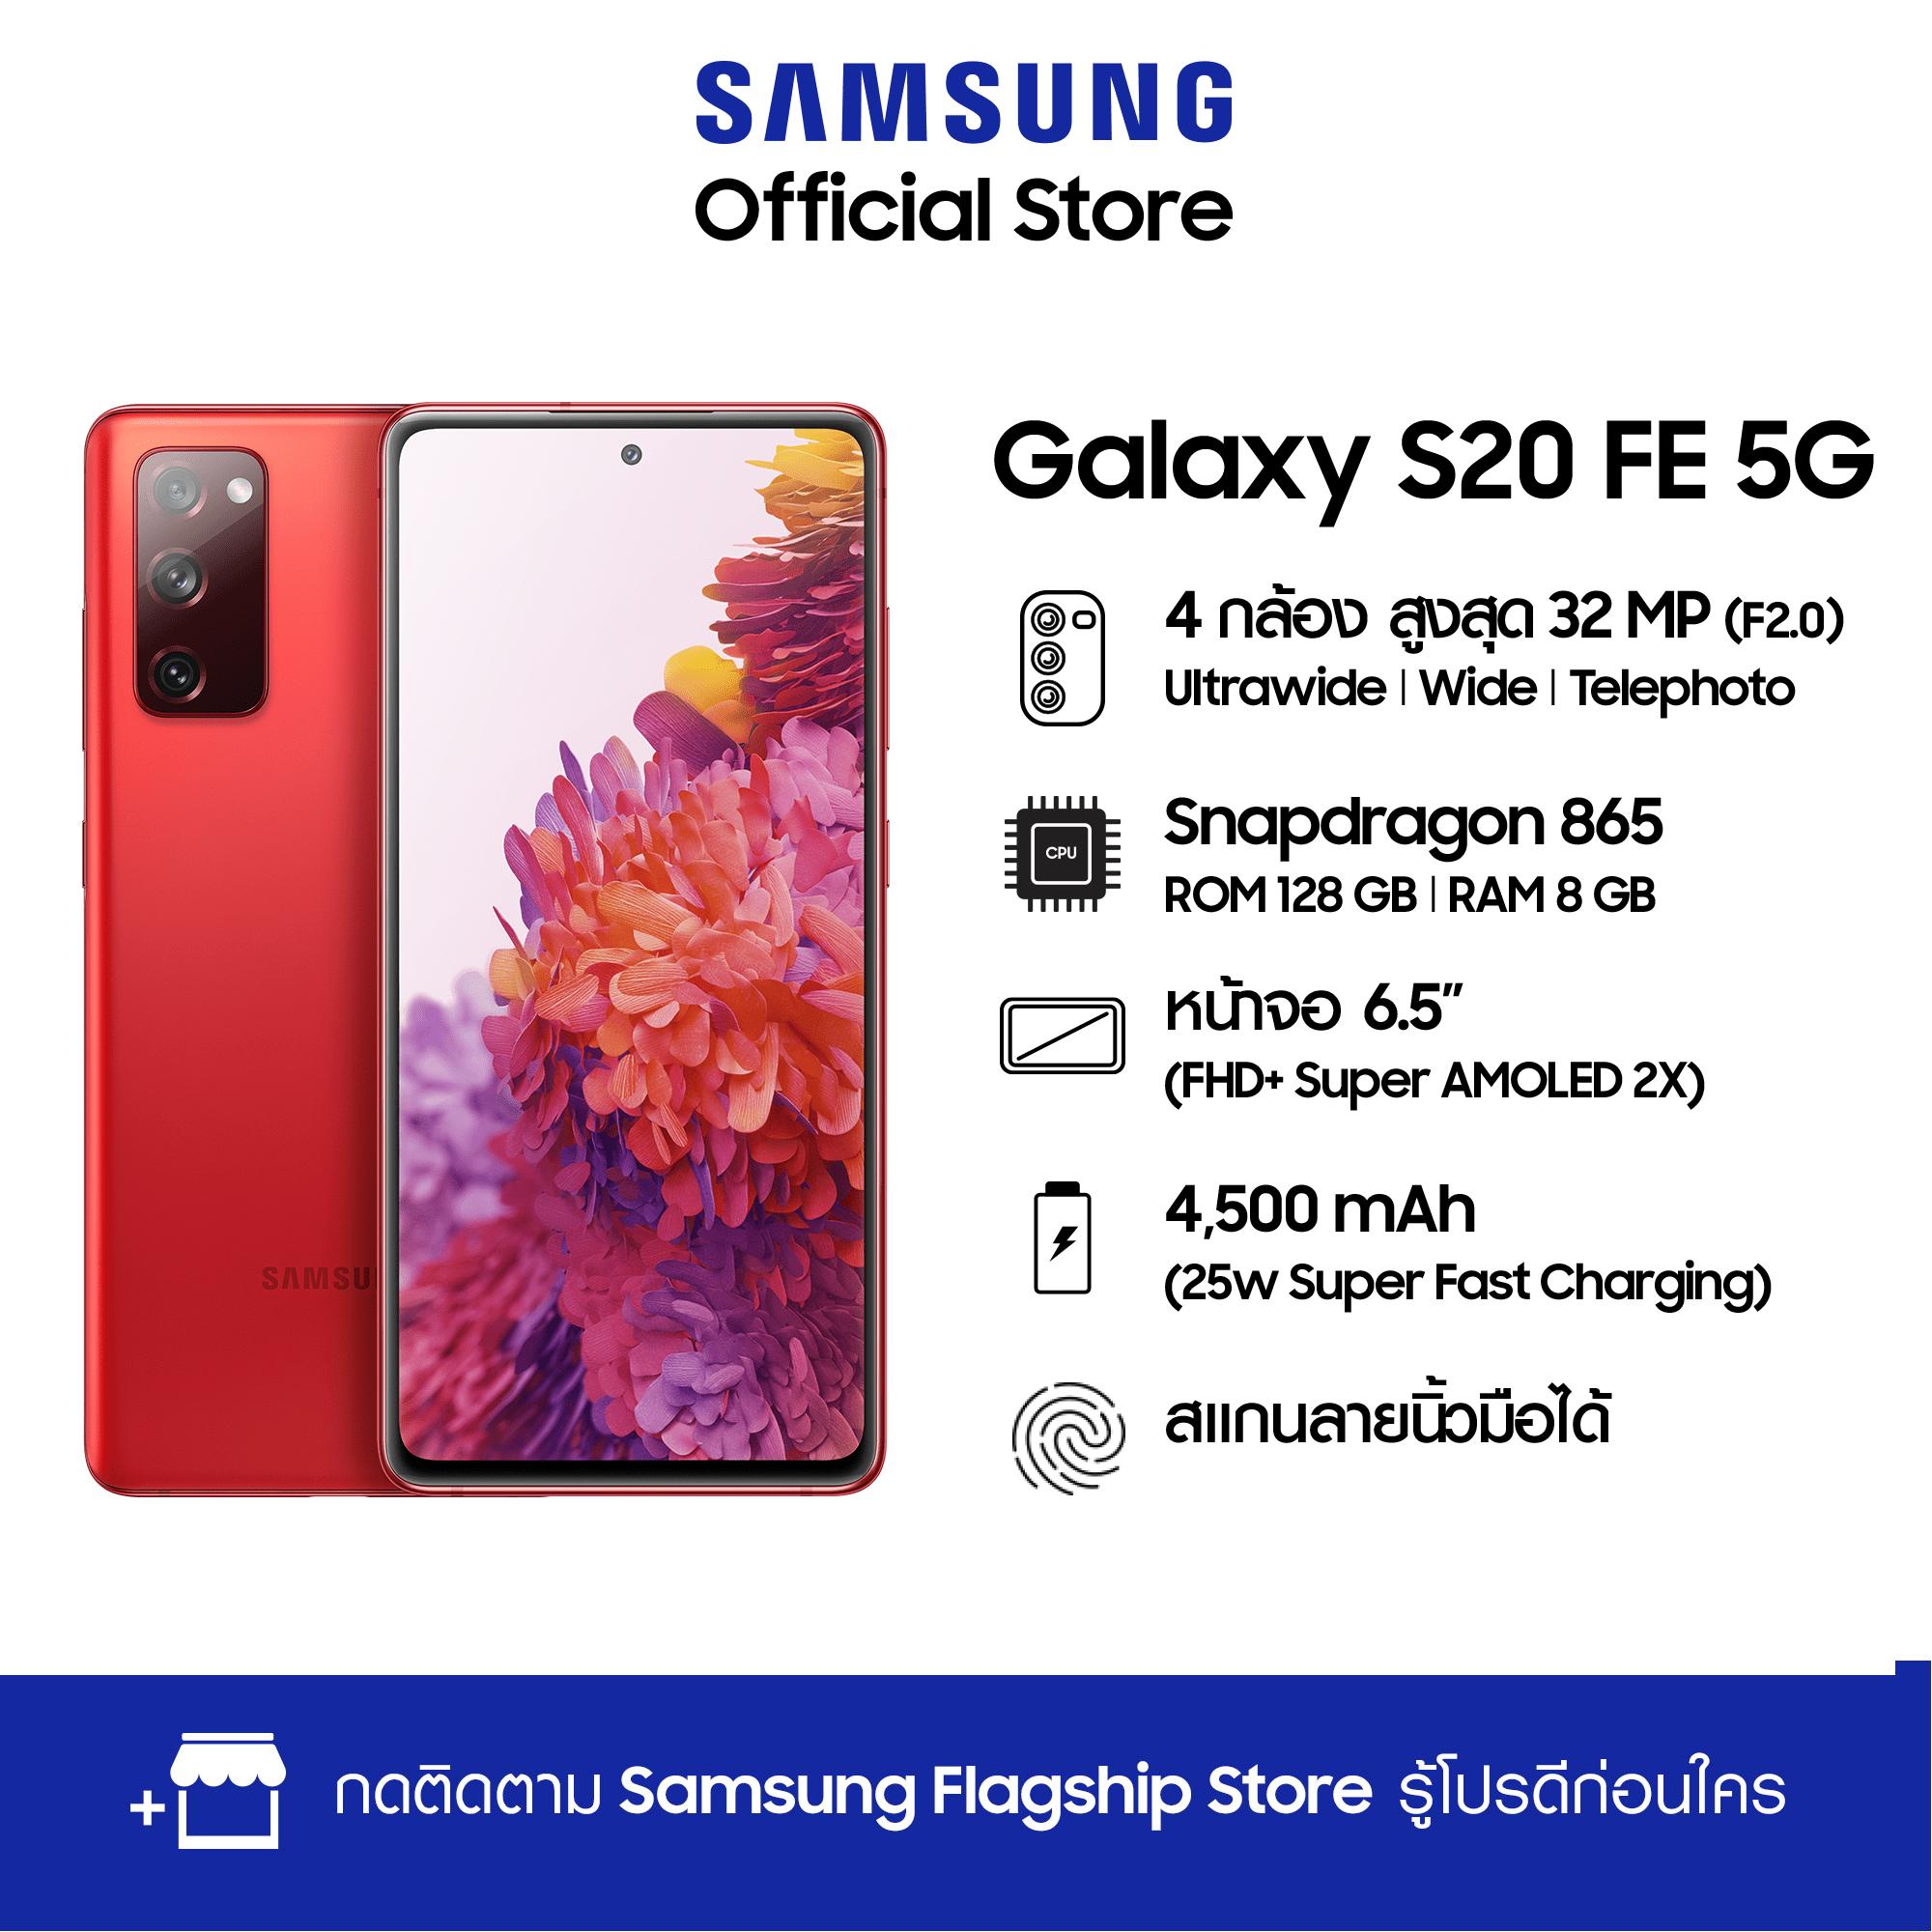 [Pre-order] Samsung Galaxy S20 FE 4G 8/128 GB รับสิทธิ์อัพเกรดเป็น 5G รับ cashback 10% เข้า Lazada Wallet เริ่มจัดส่งสินค้า วันที่ 14 ตุลาคม 2563 เป็นต้นไป